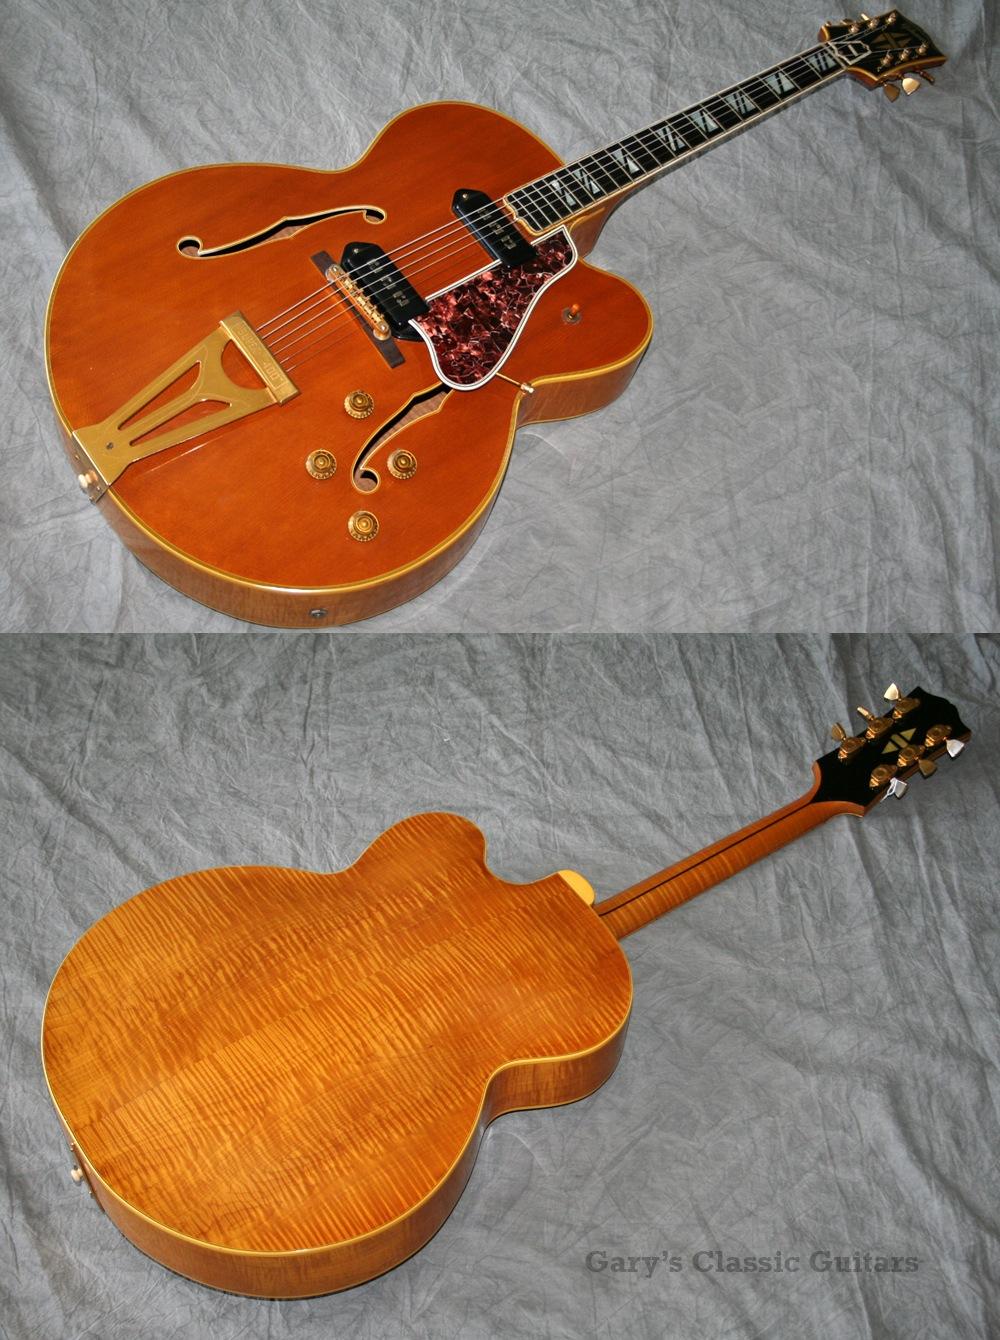 1957 Gibson Super 400 CESN